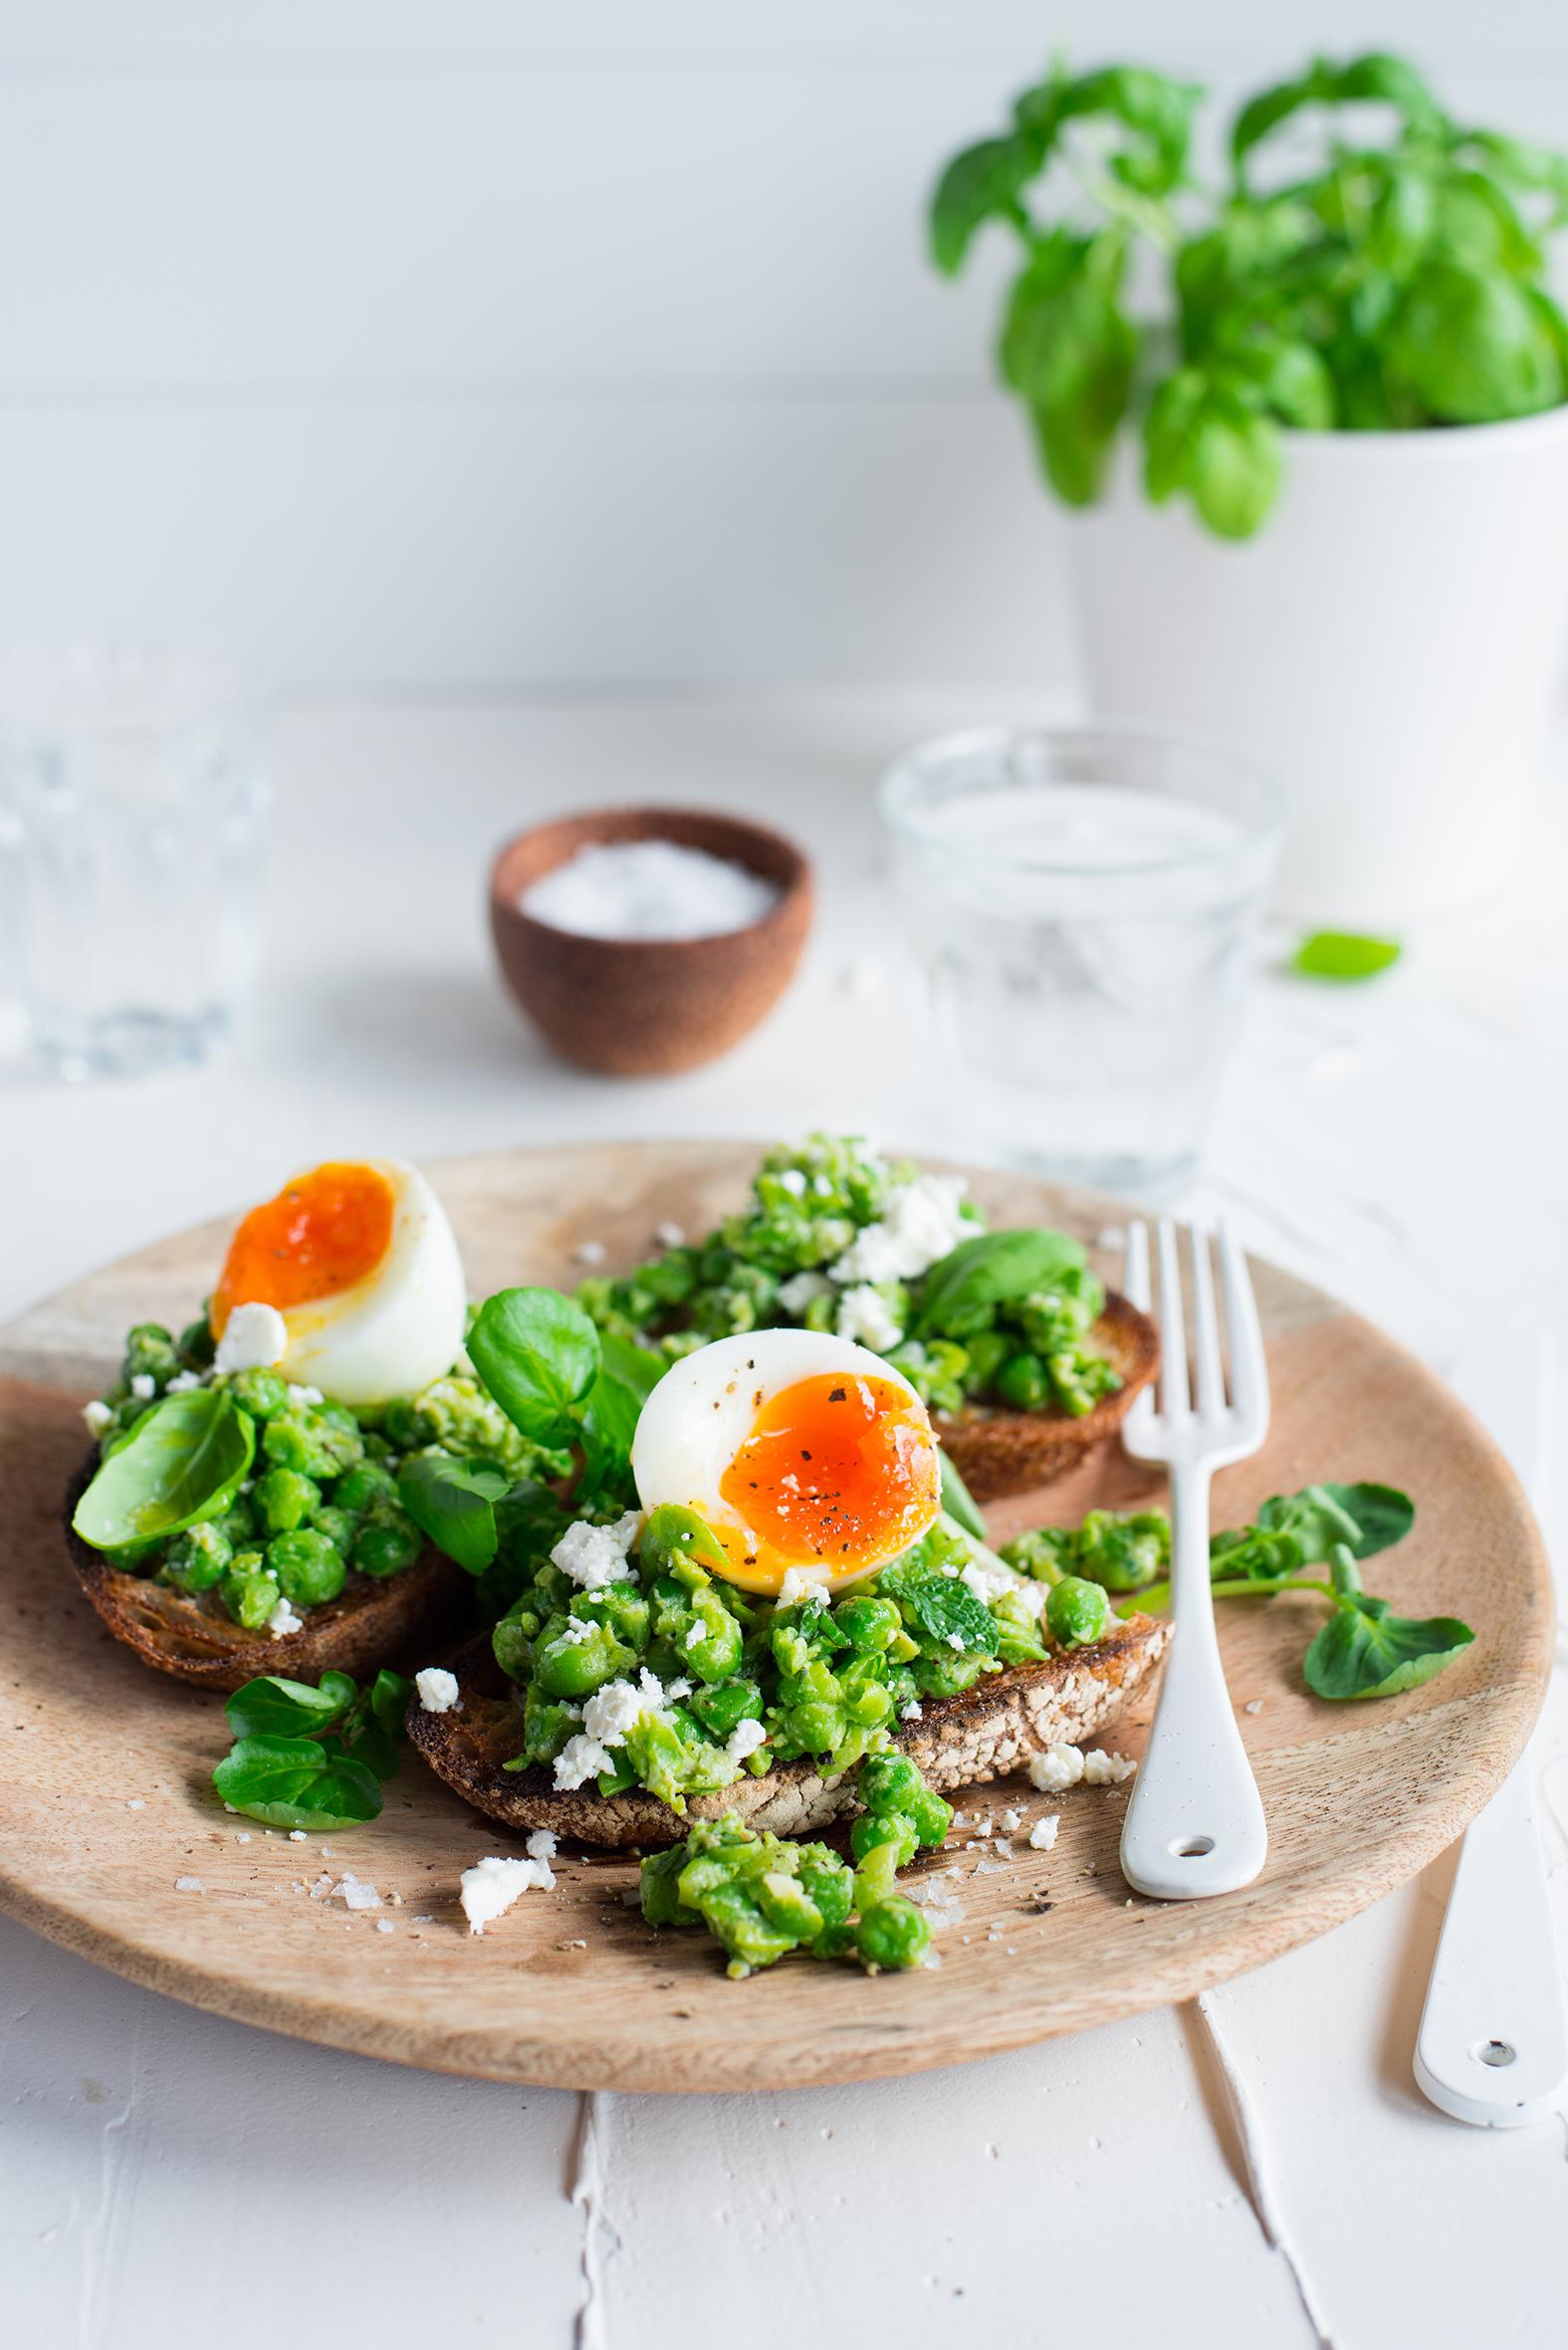 Dish - Green Monday's - Pea Smash-9850-5-small.jpg